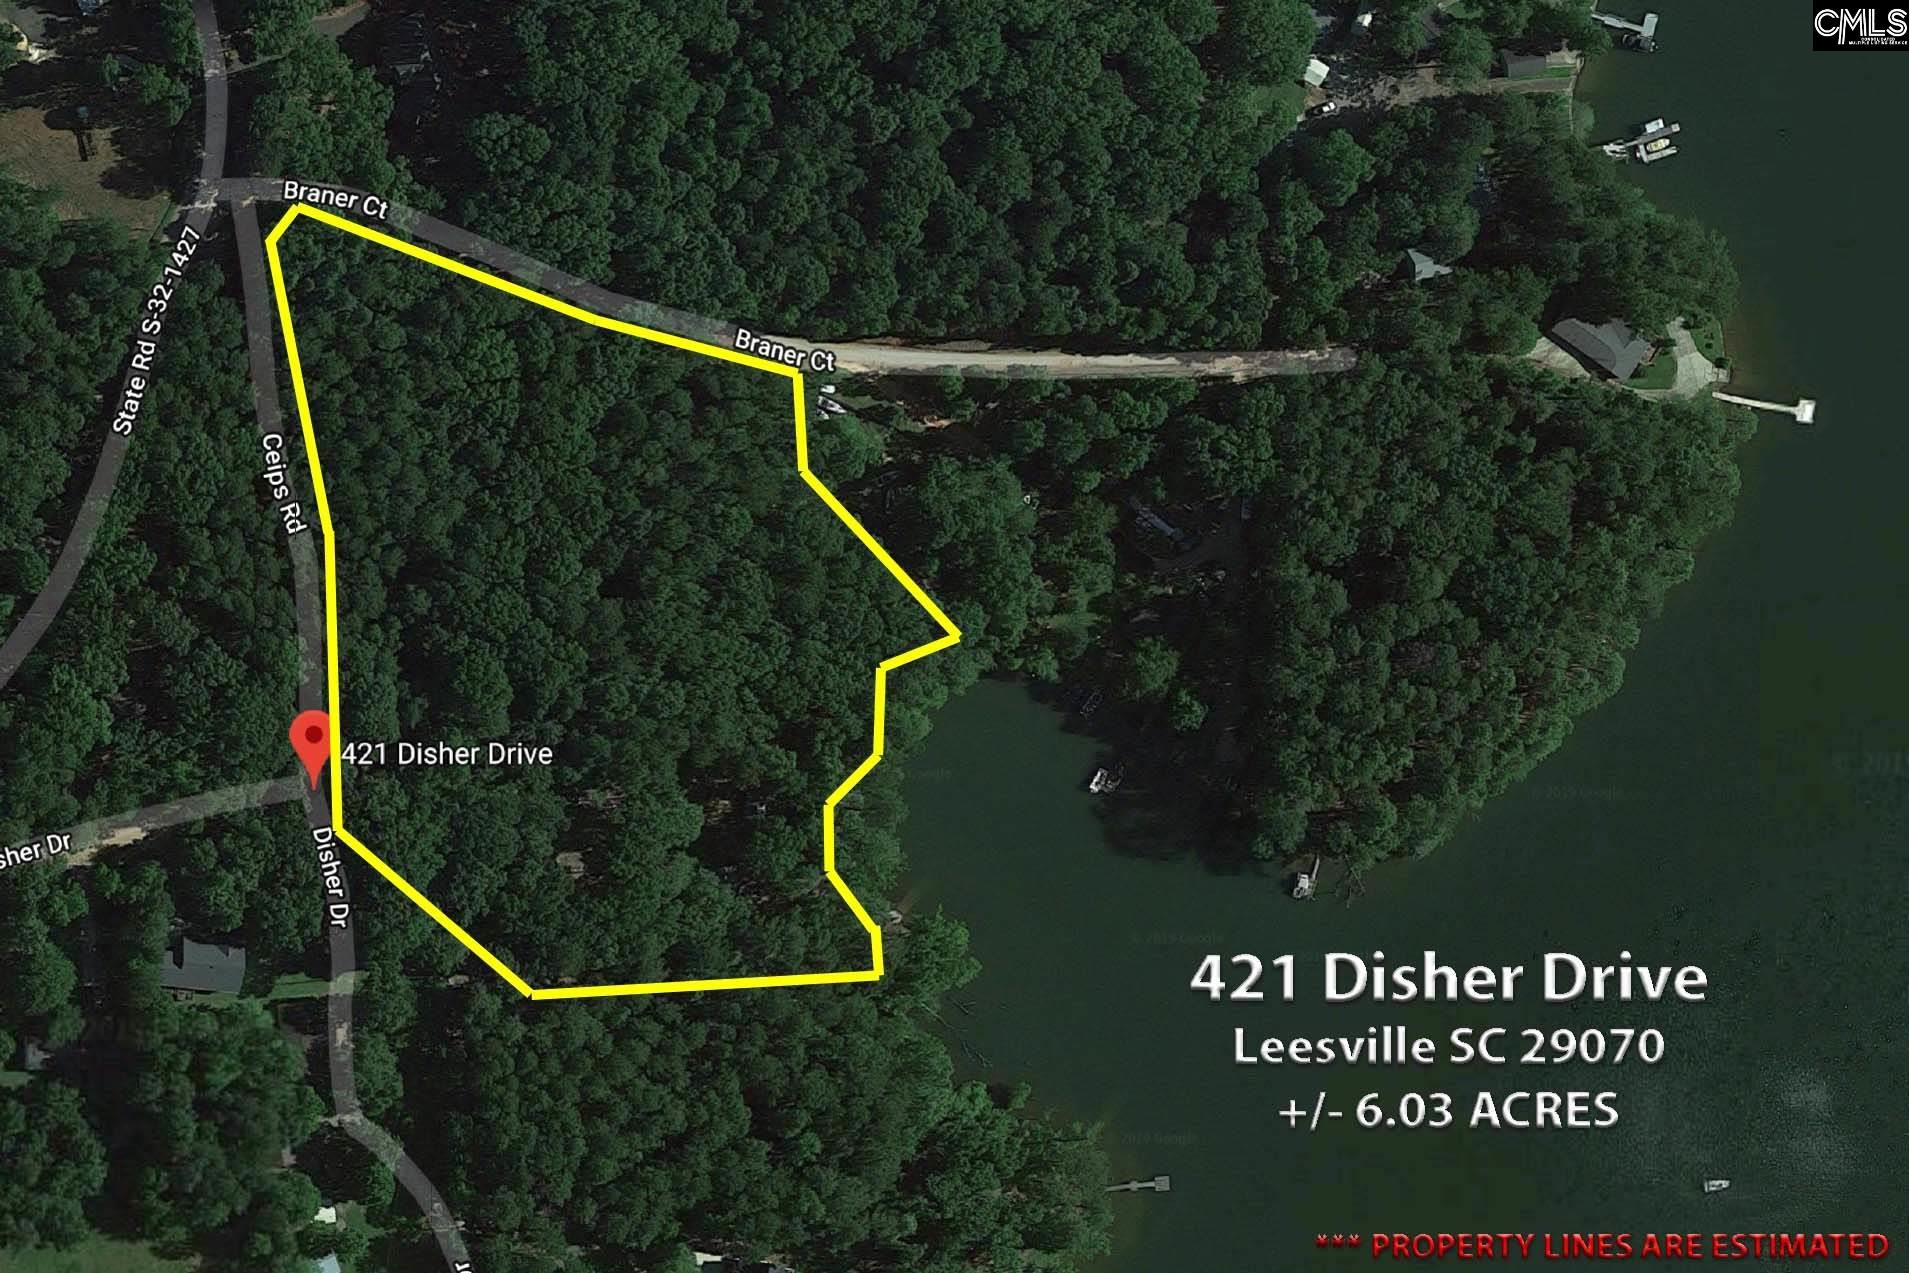 421 Disher Leesville, SC 29070